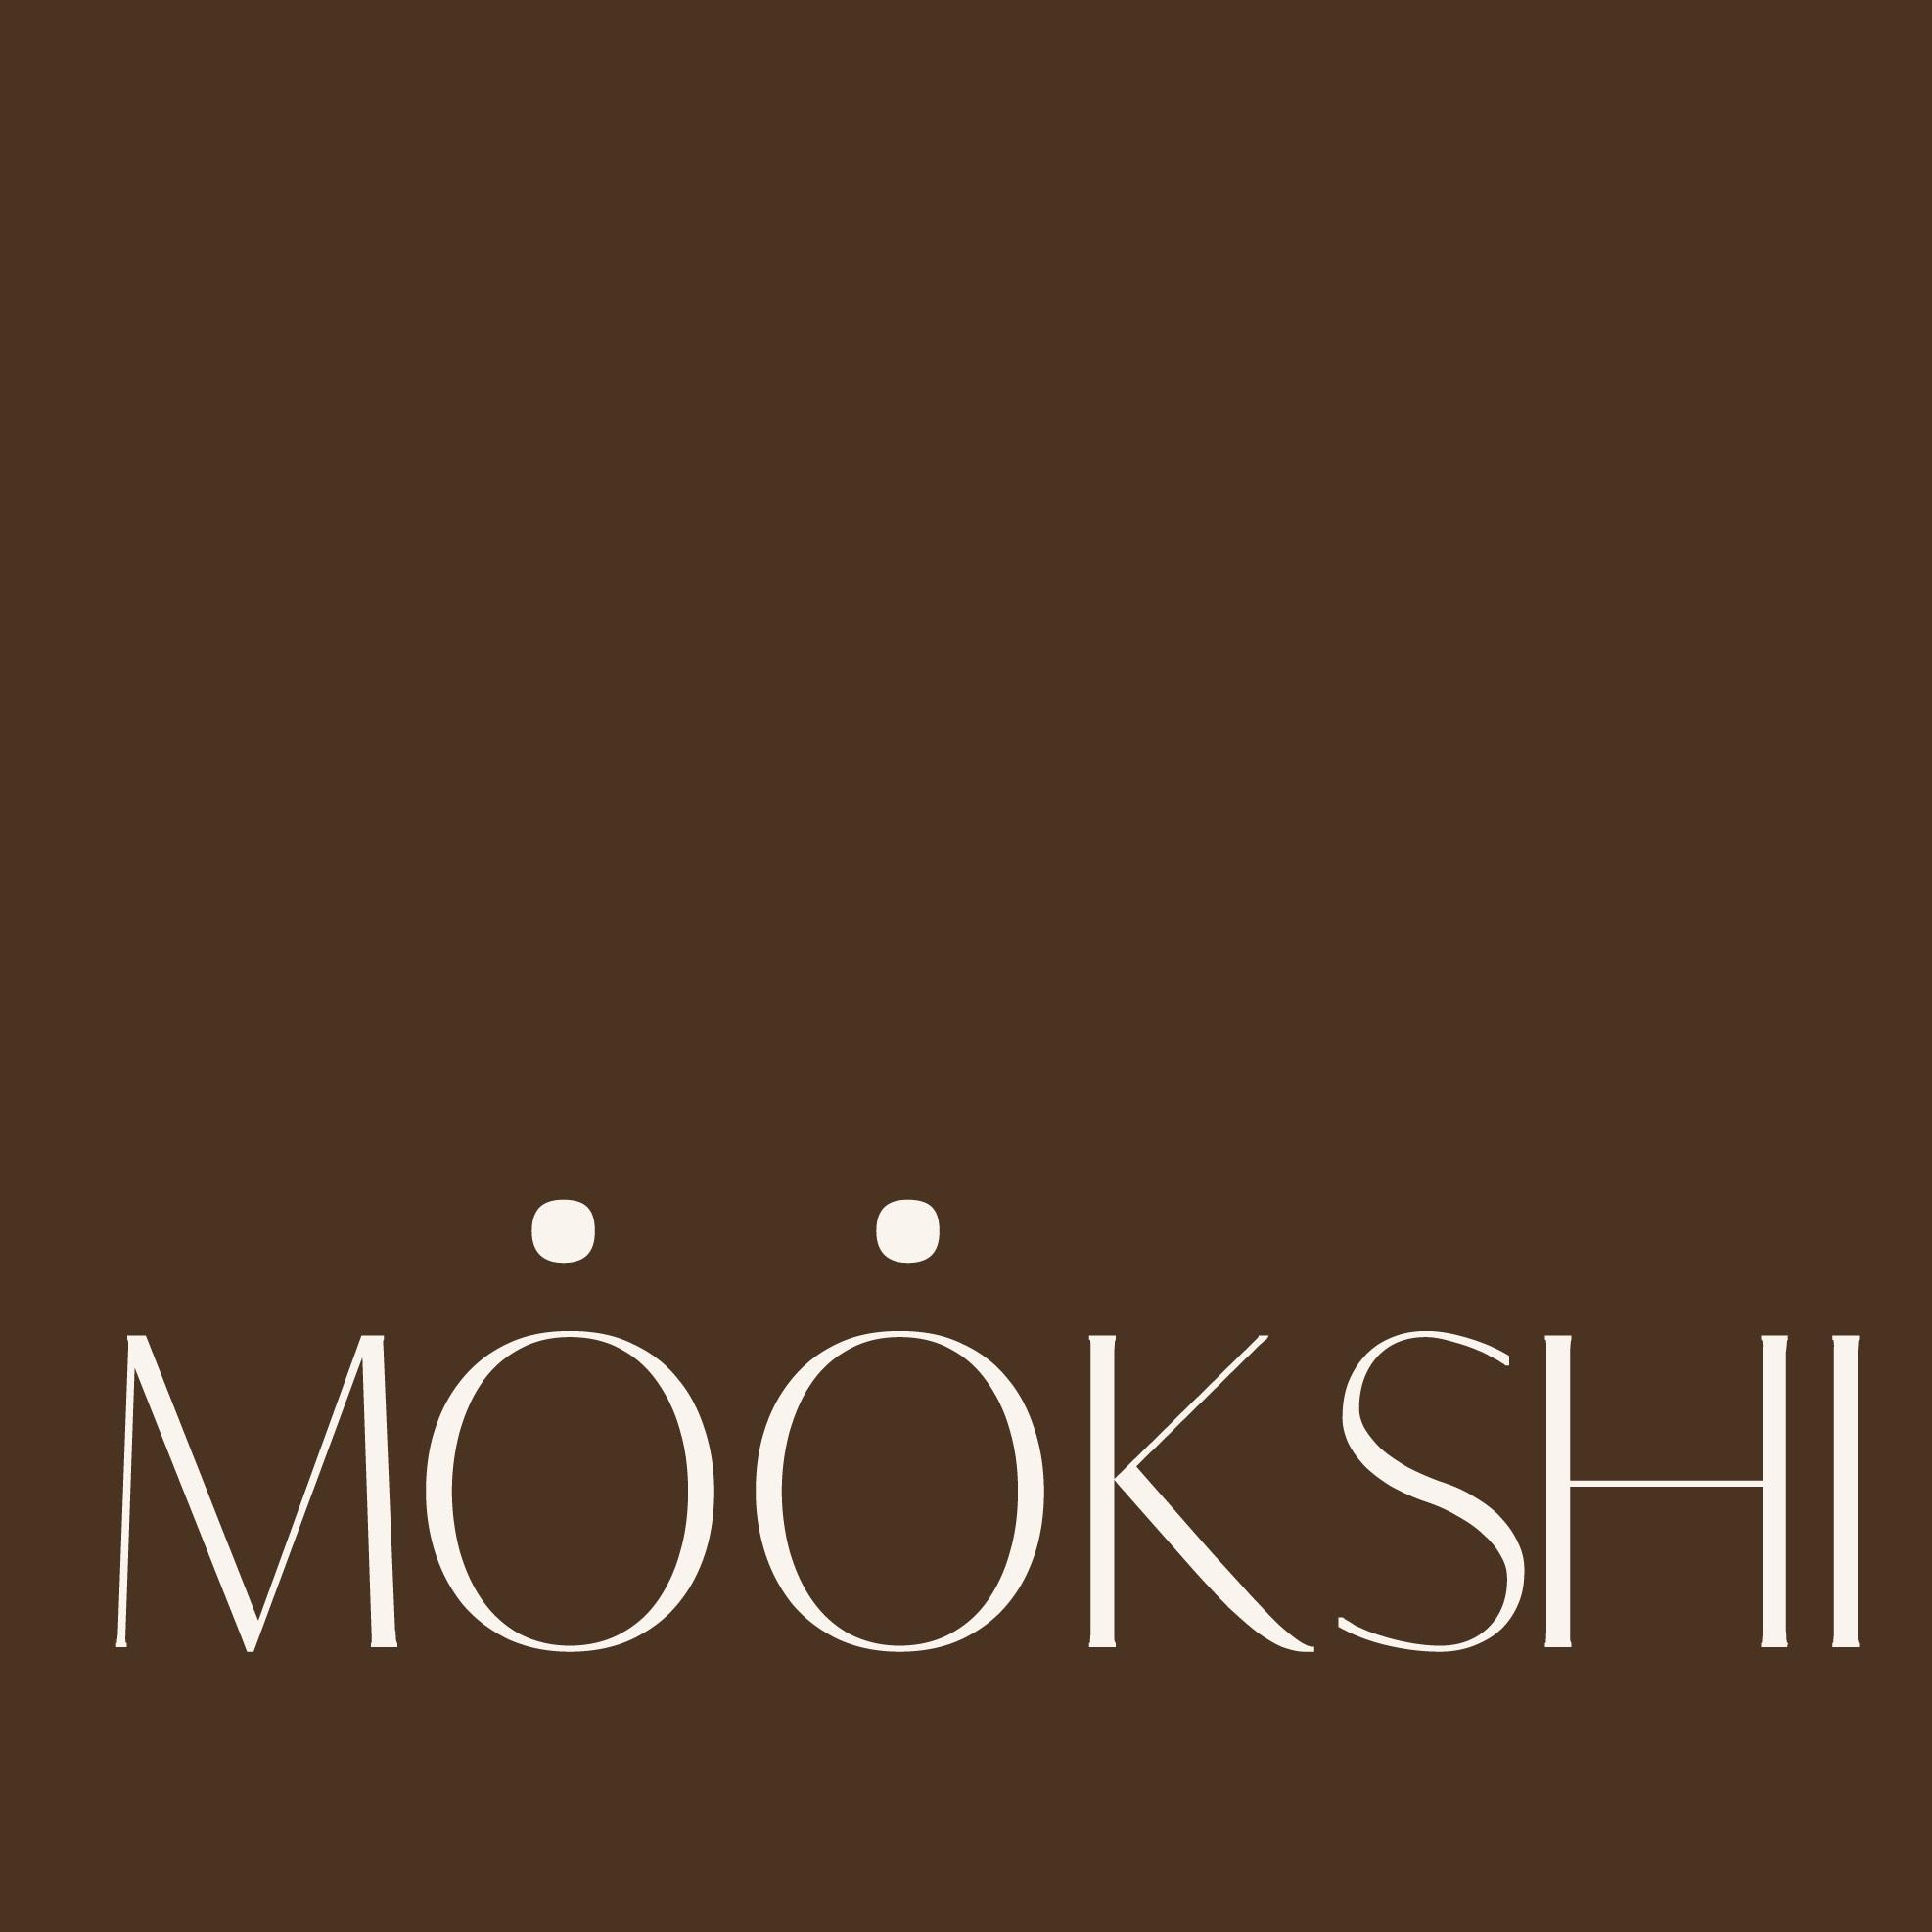 Mookshi-wellness-gift-certificates.jpg